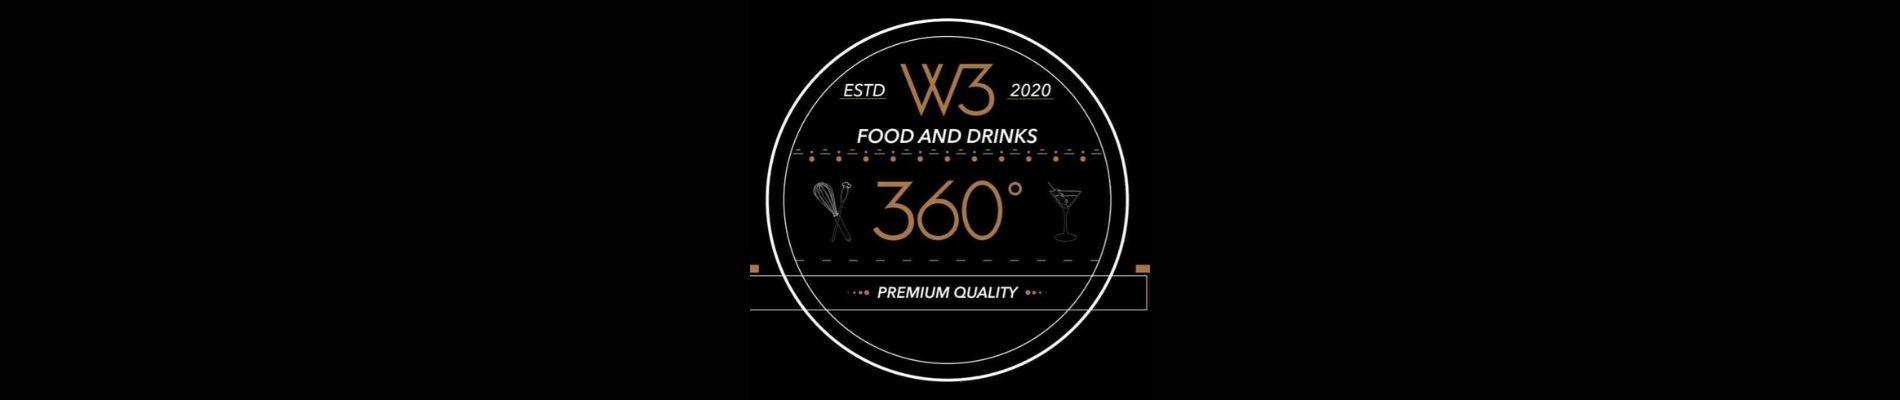 Restaurant Neumarkt W360 Trailer Teaser